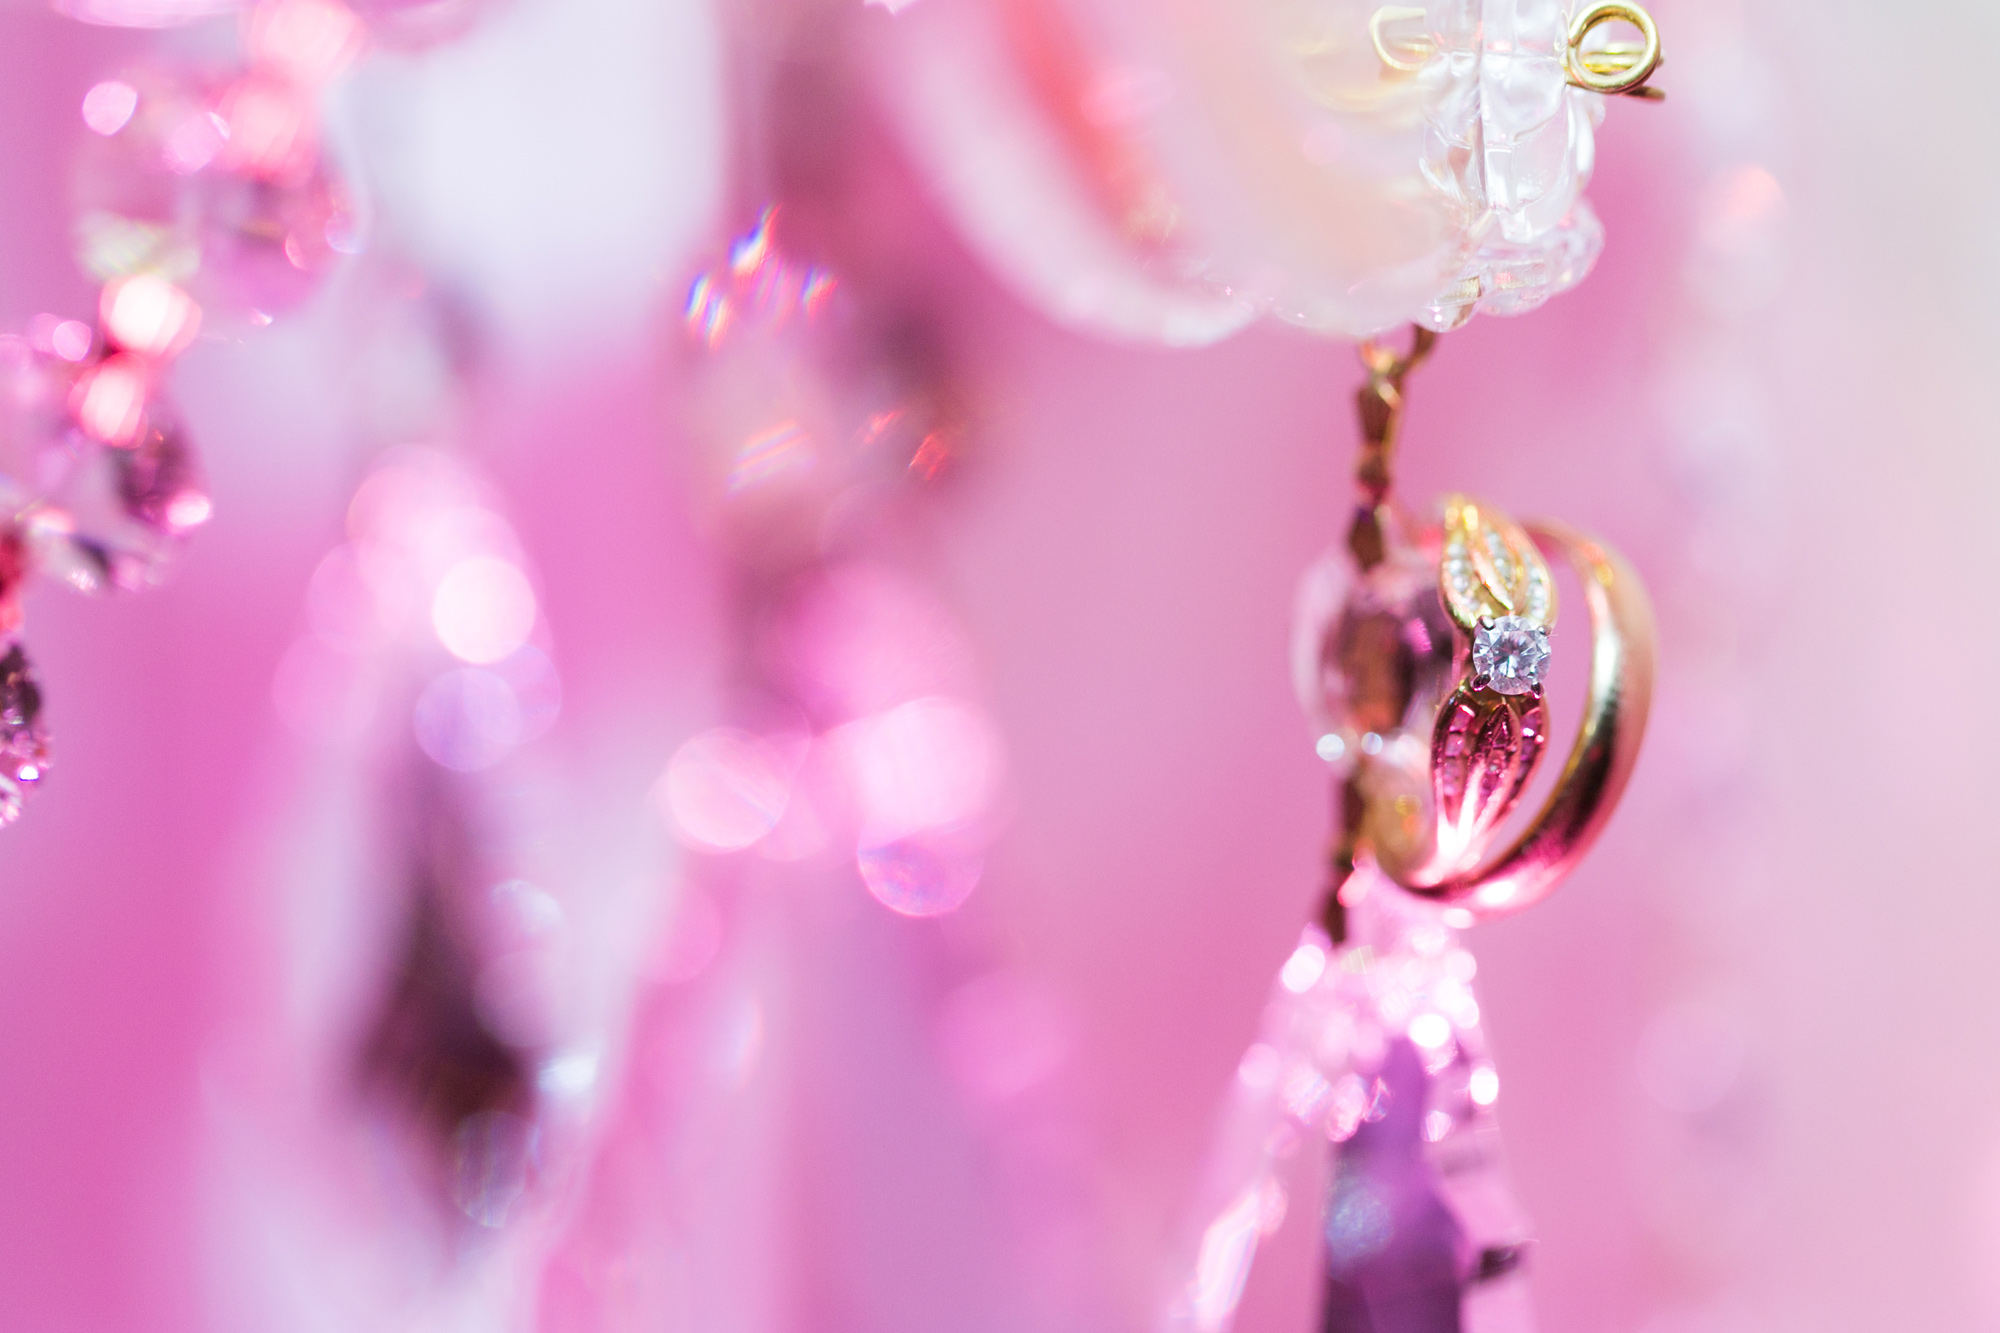 148-lord-nelson-wedding------.jpg